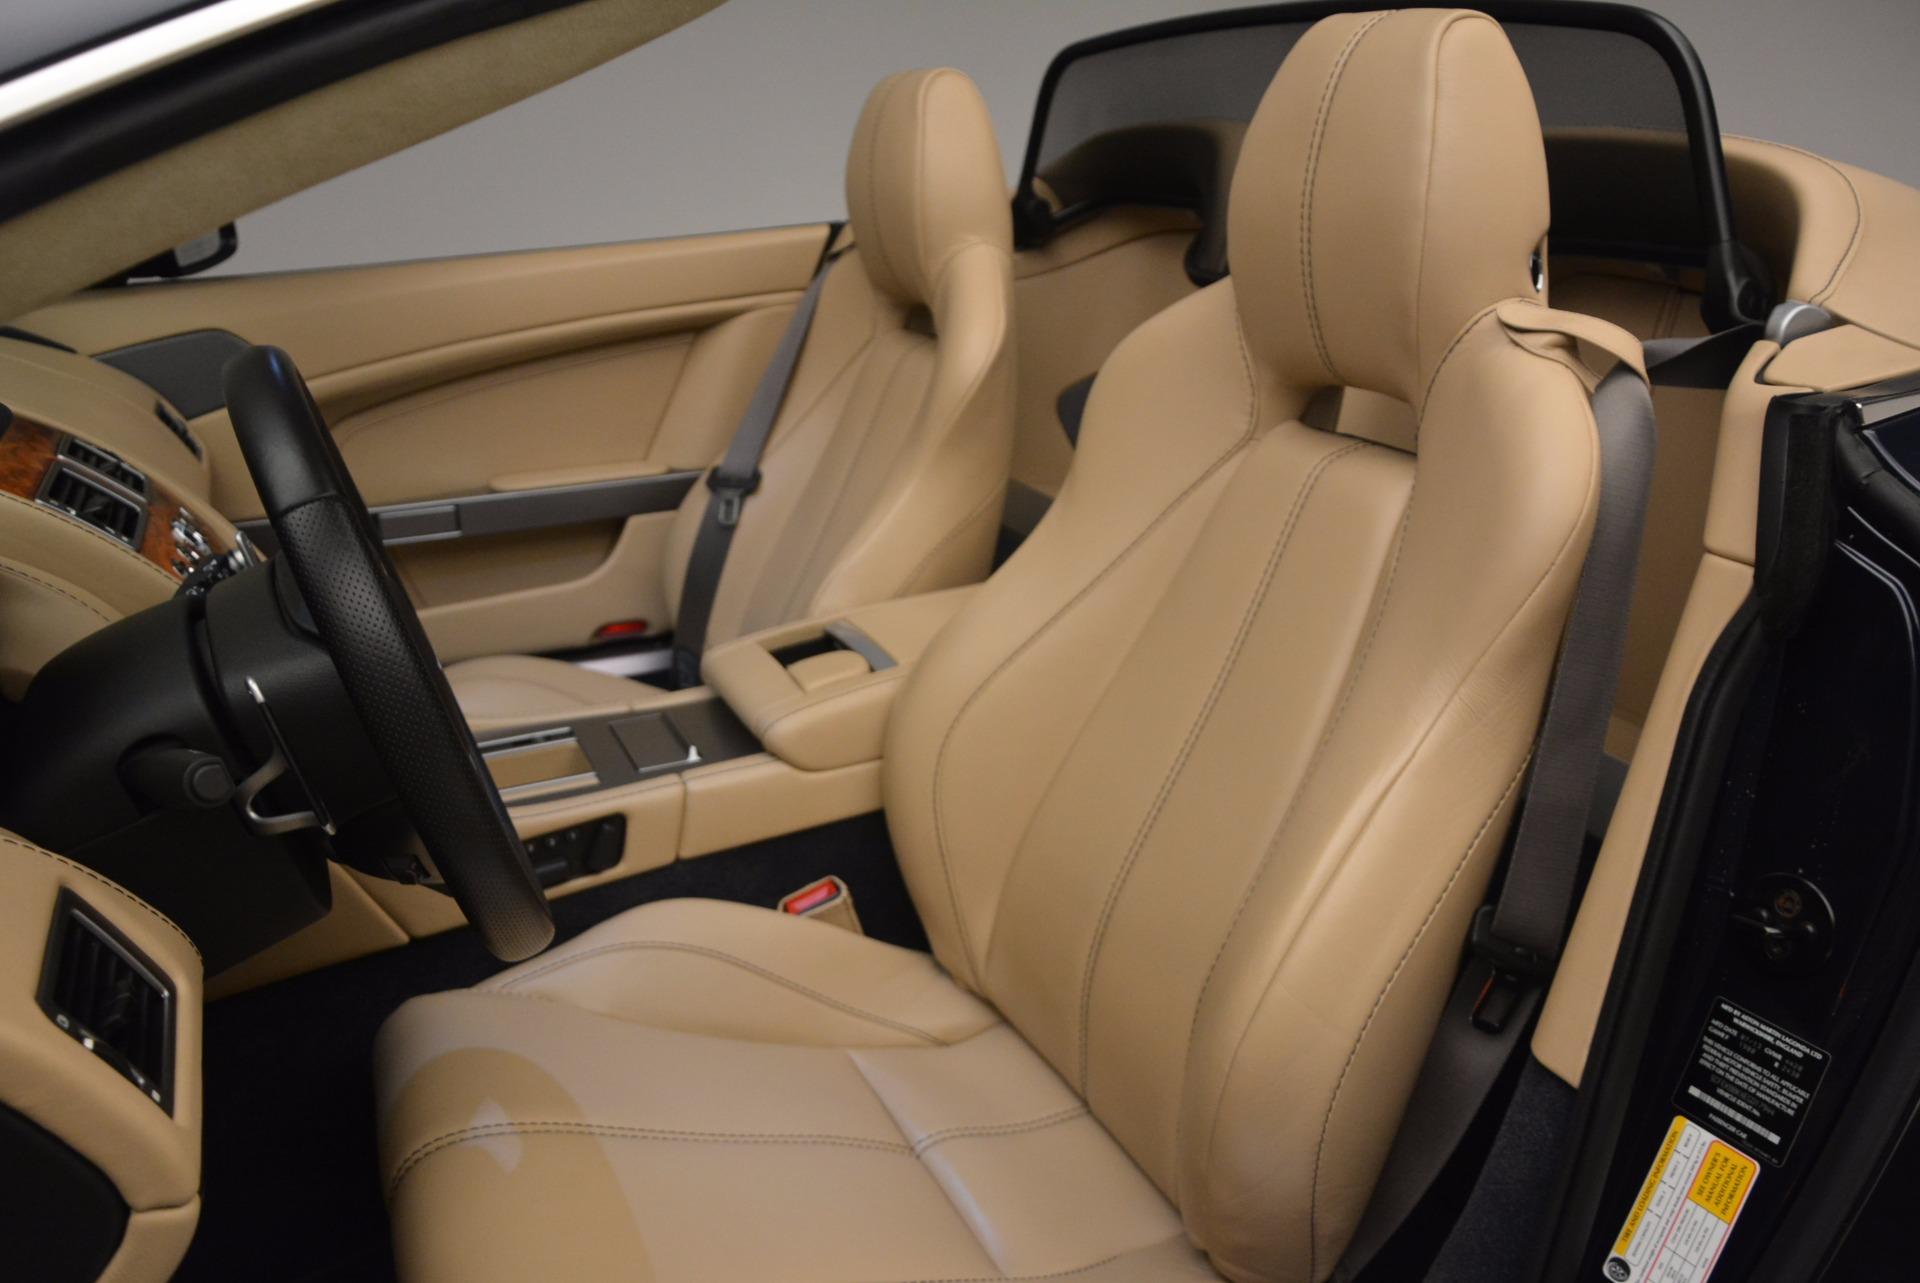 Used 2014 Aston Martin V8 Vantage Roadster For Sale In Westport, CT 1623_p23